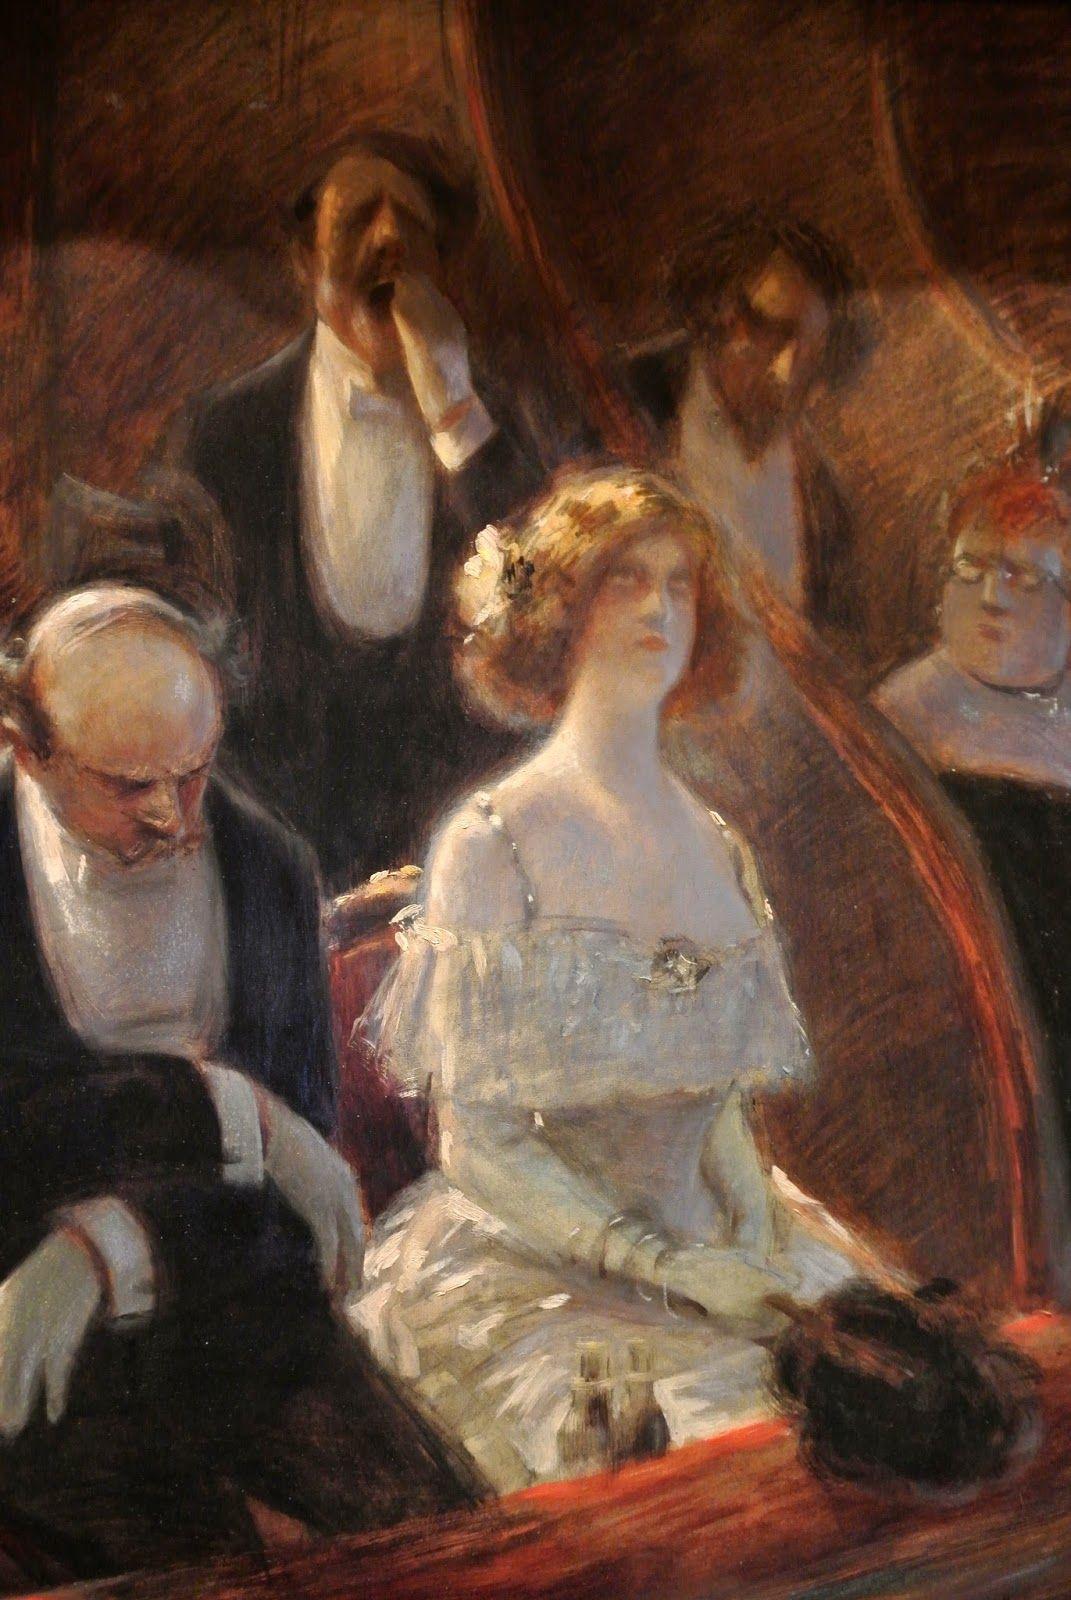 1905 environ, Albert GUILLAUME, Musique savante